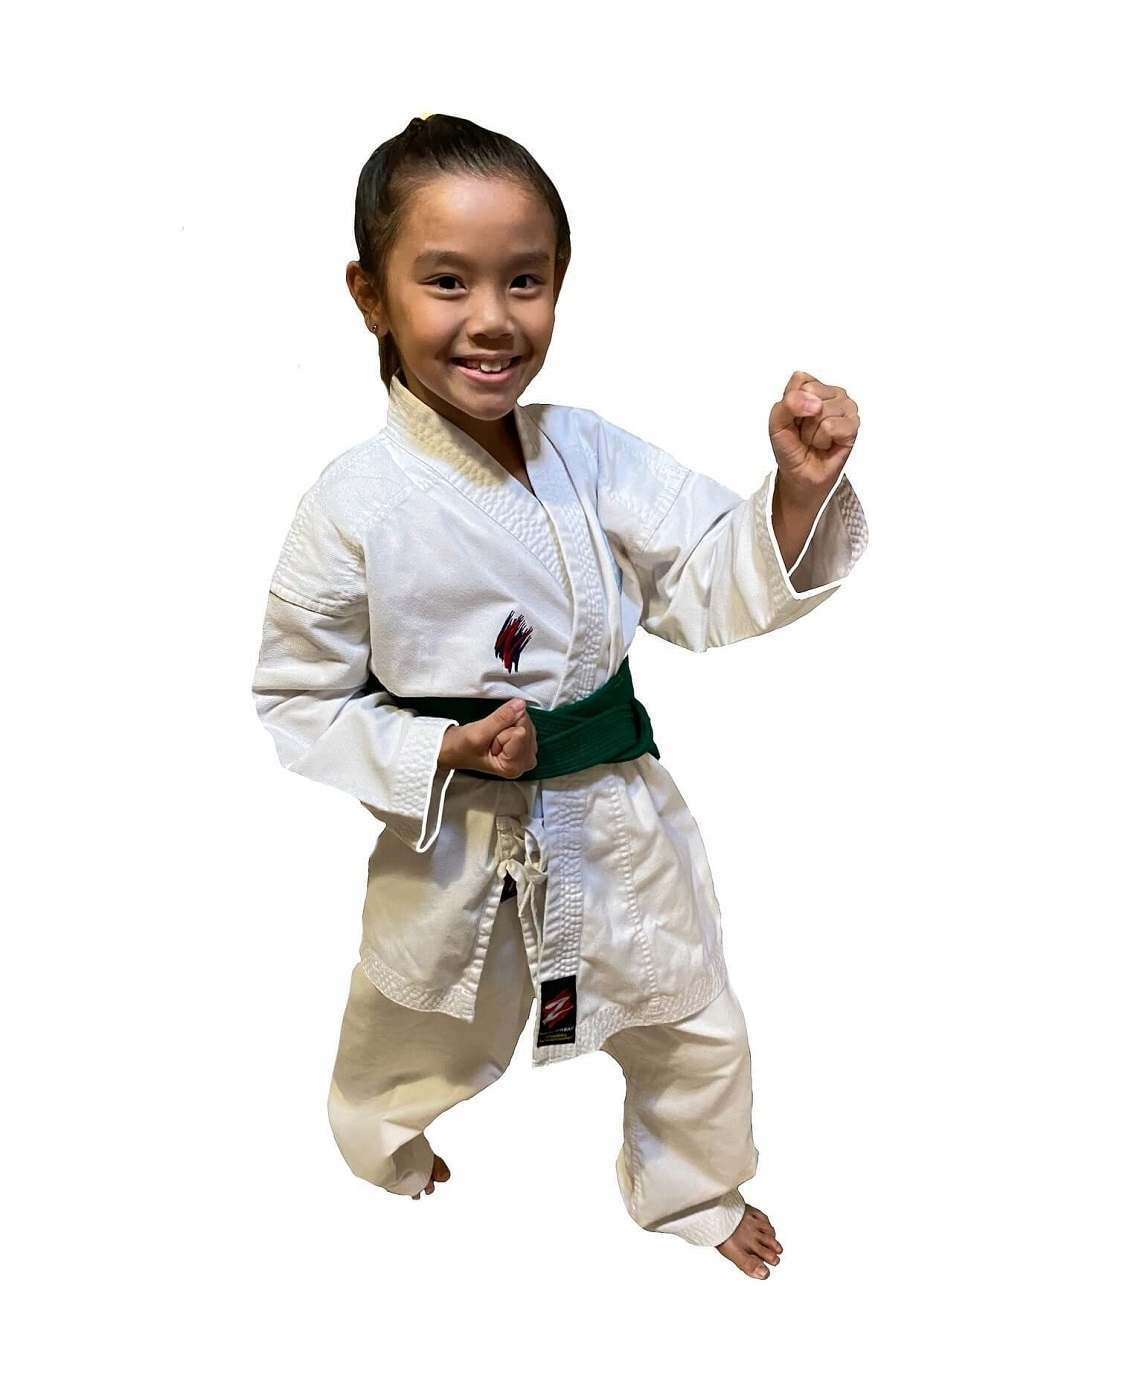 Webp.net Resizeimage, Karate International Of Apex/Cary NC